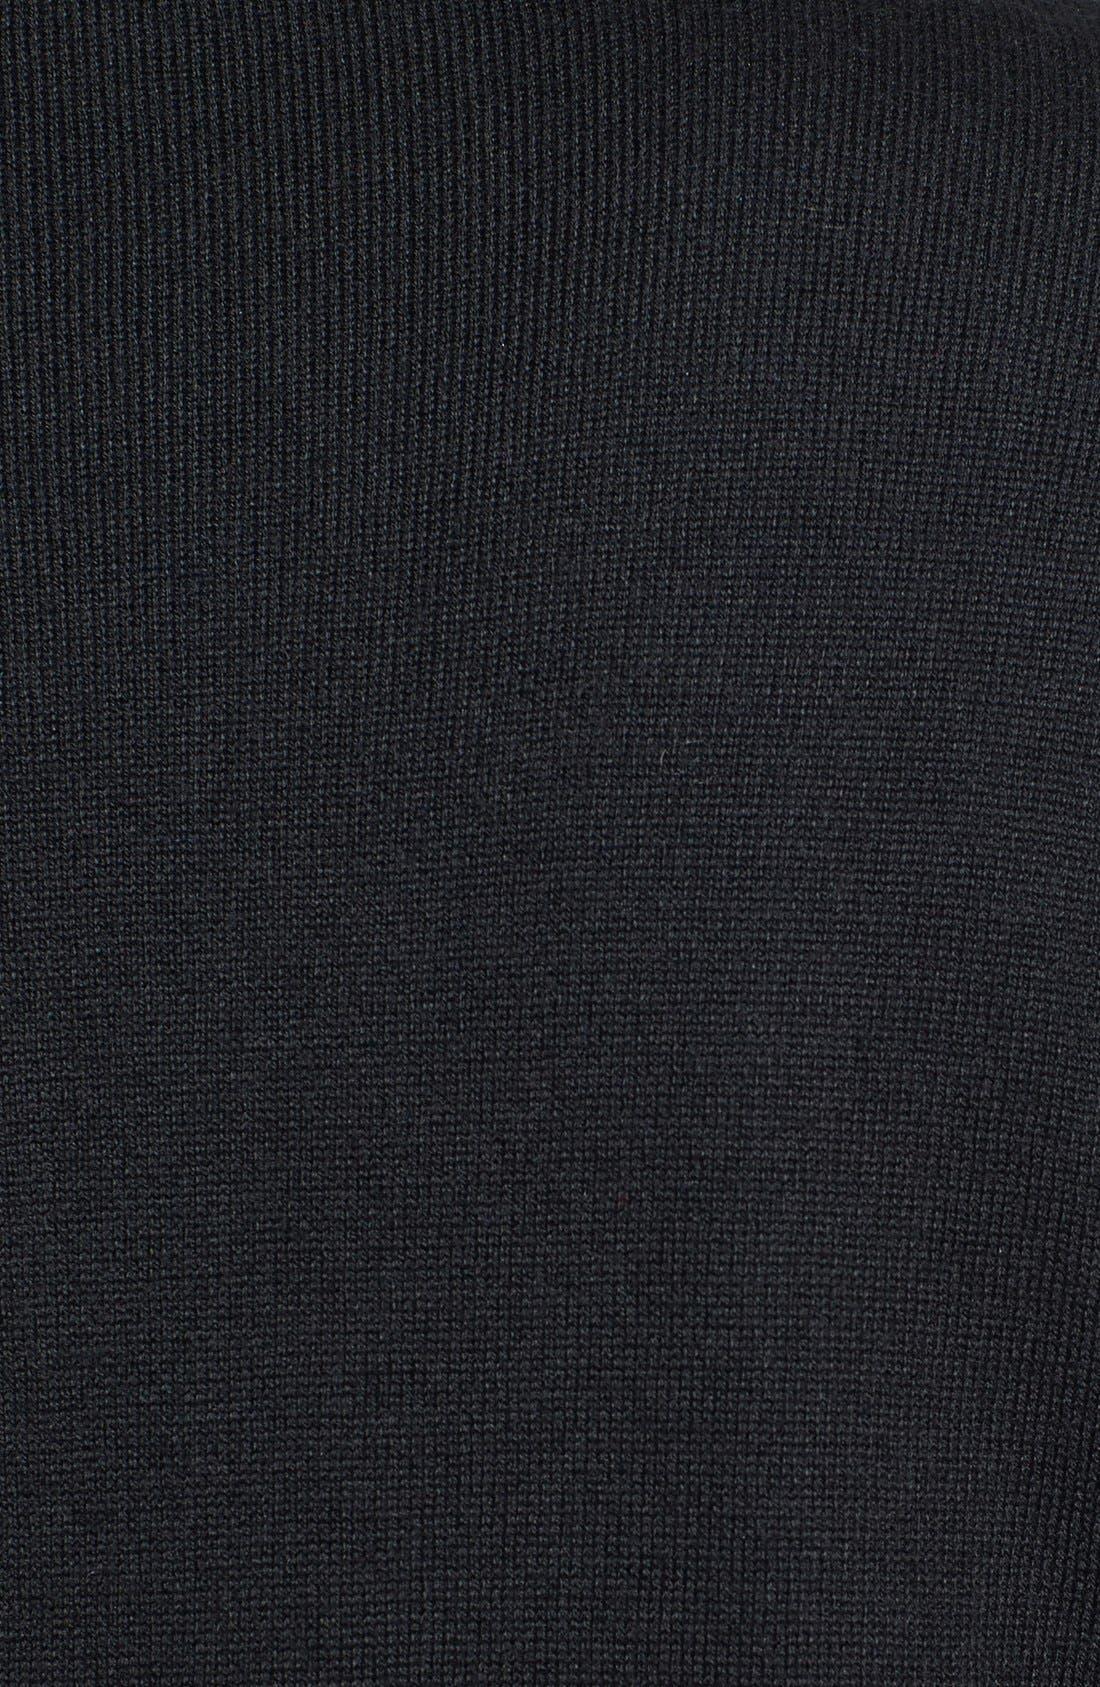 Dolman Sleeve Tunic Sweater,                             Alternate thumbnail 2, color,                             001